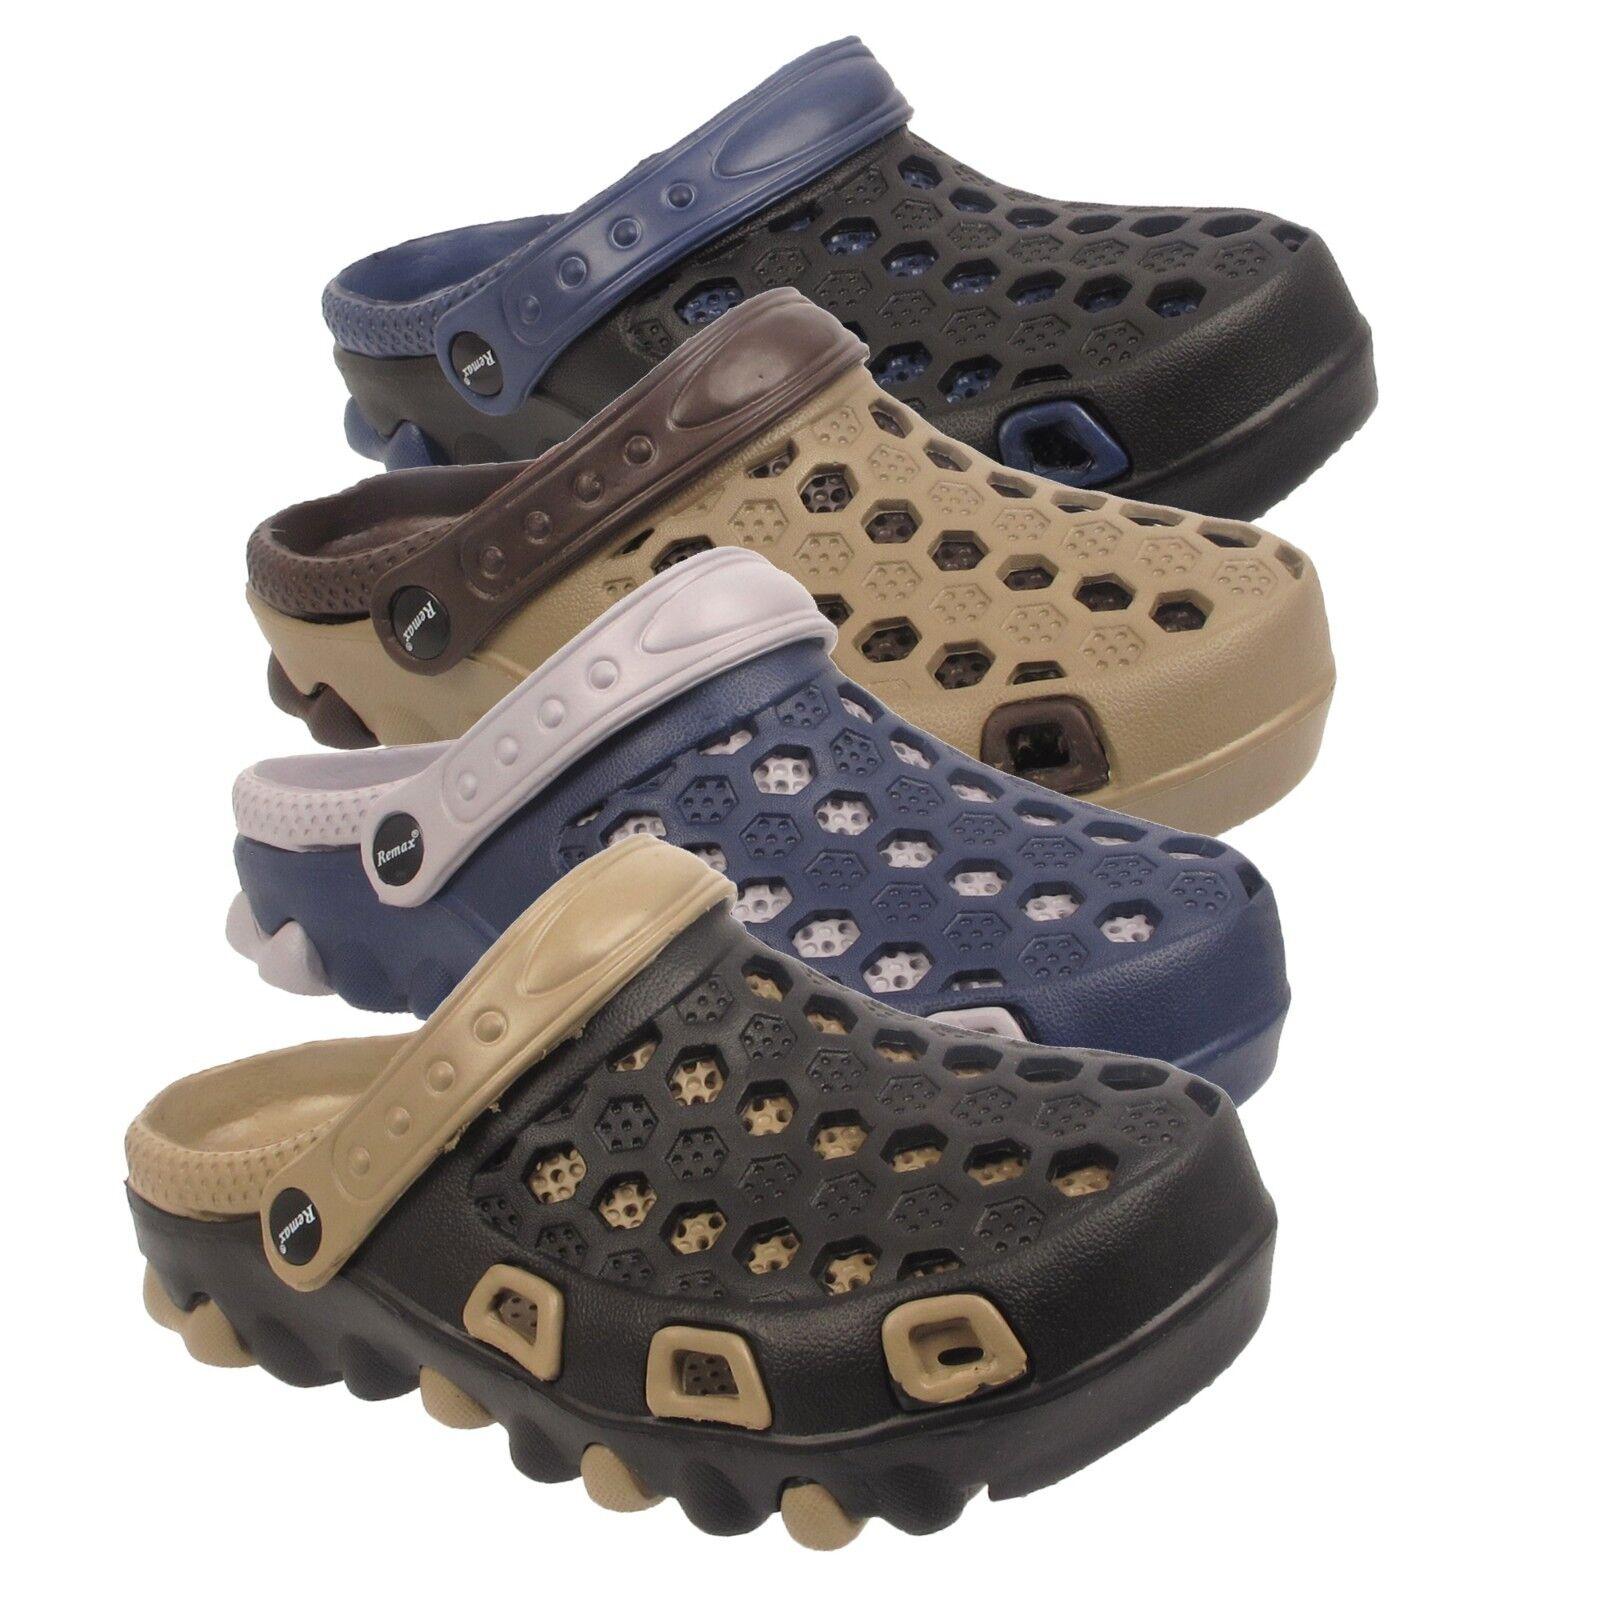 Mens Garden Clogs Sandals Beach Hospital Shoes Fishing Summer Sandals Clogs Gardening Mules 4dfbeb